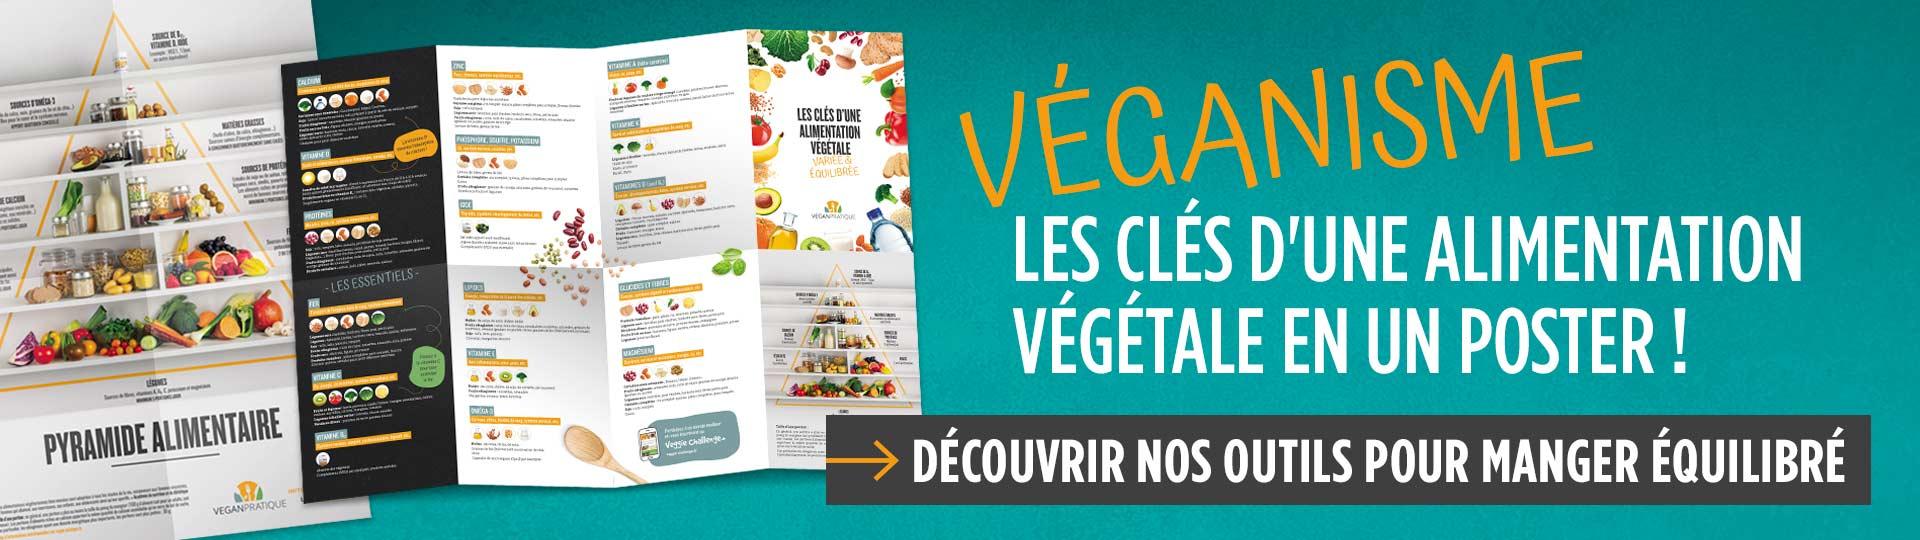 Pyramide alimentaire vegan